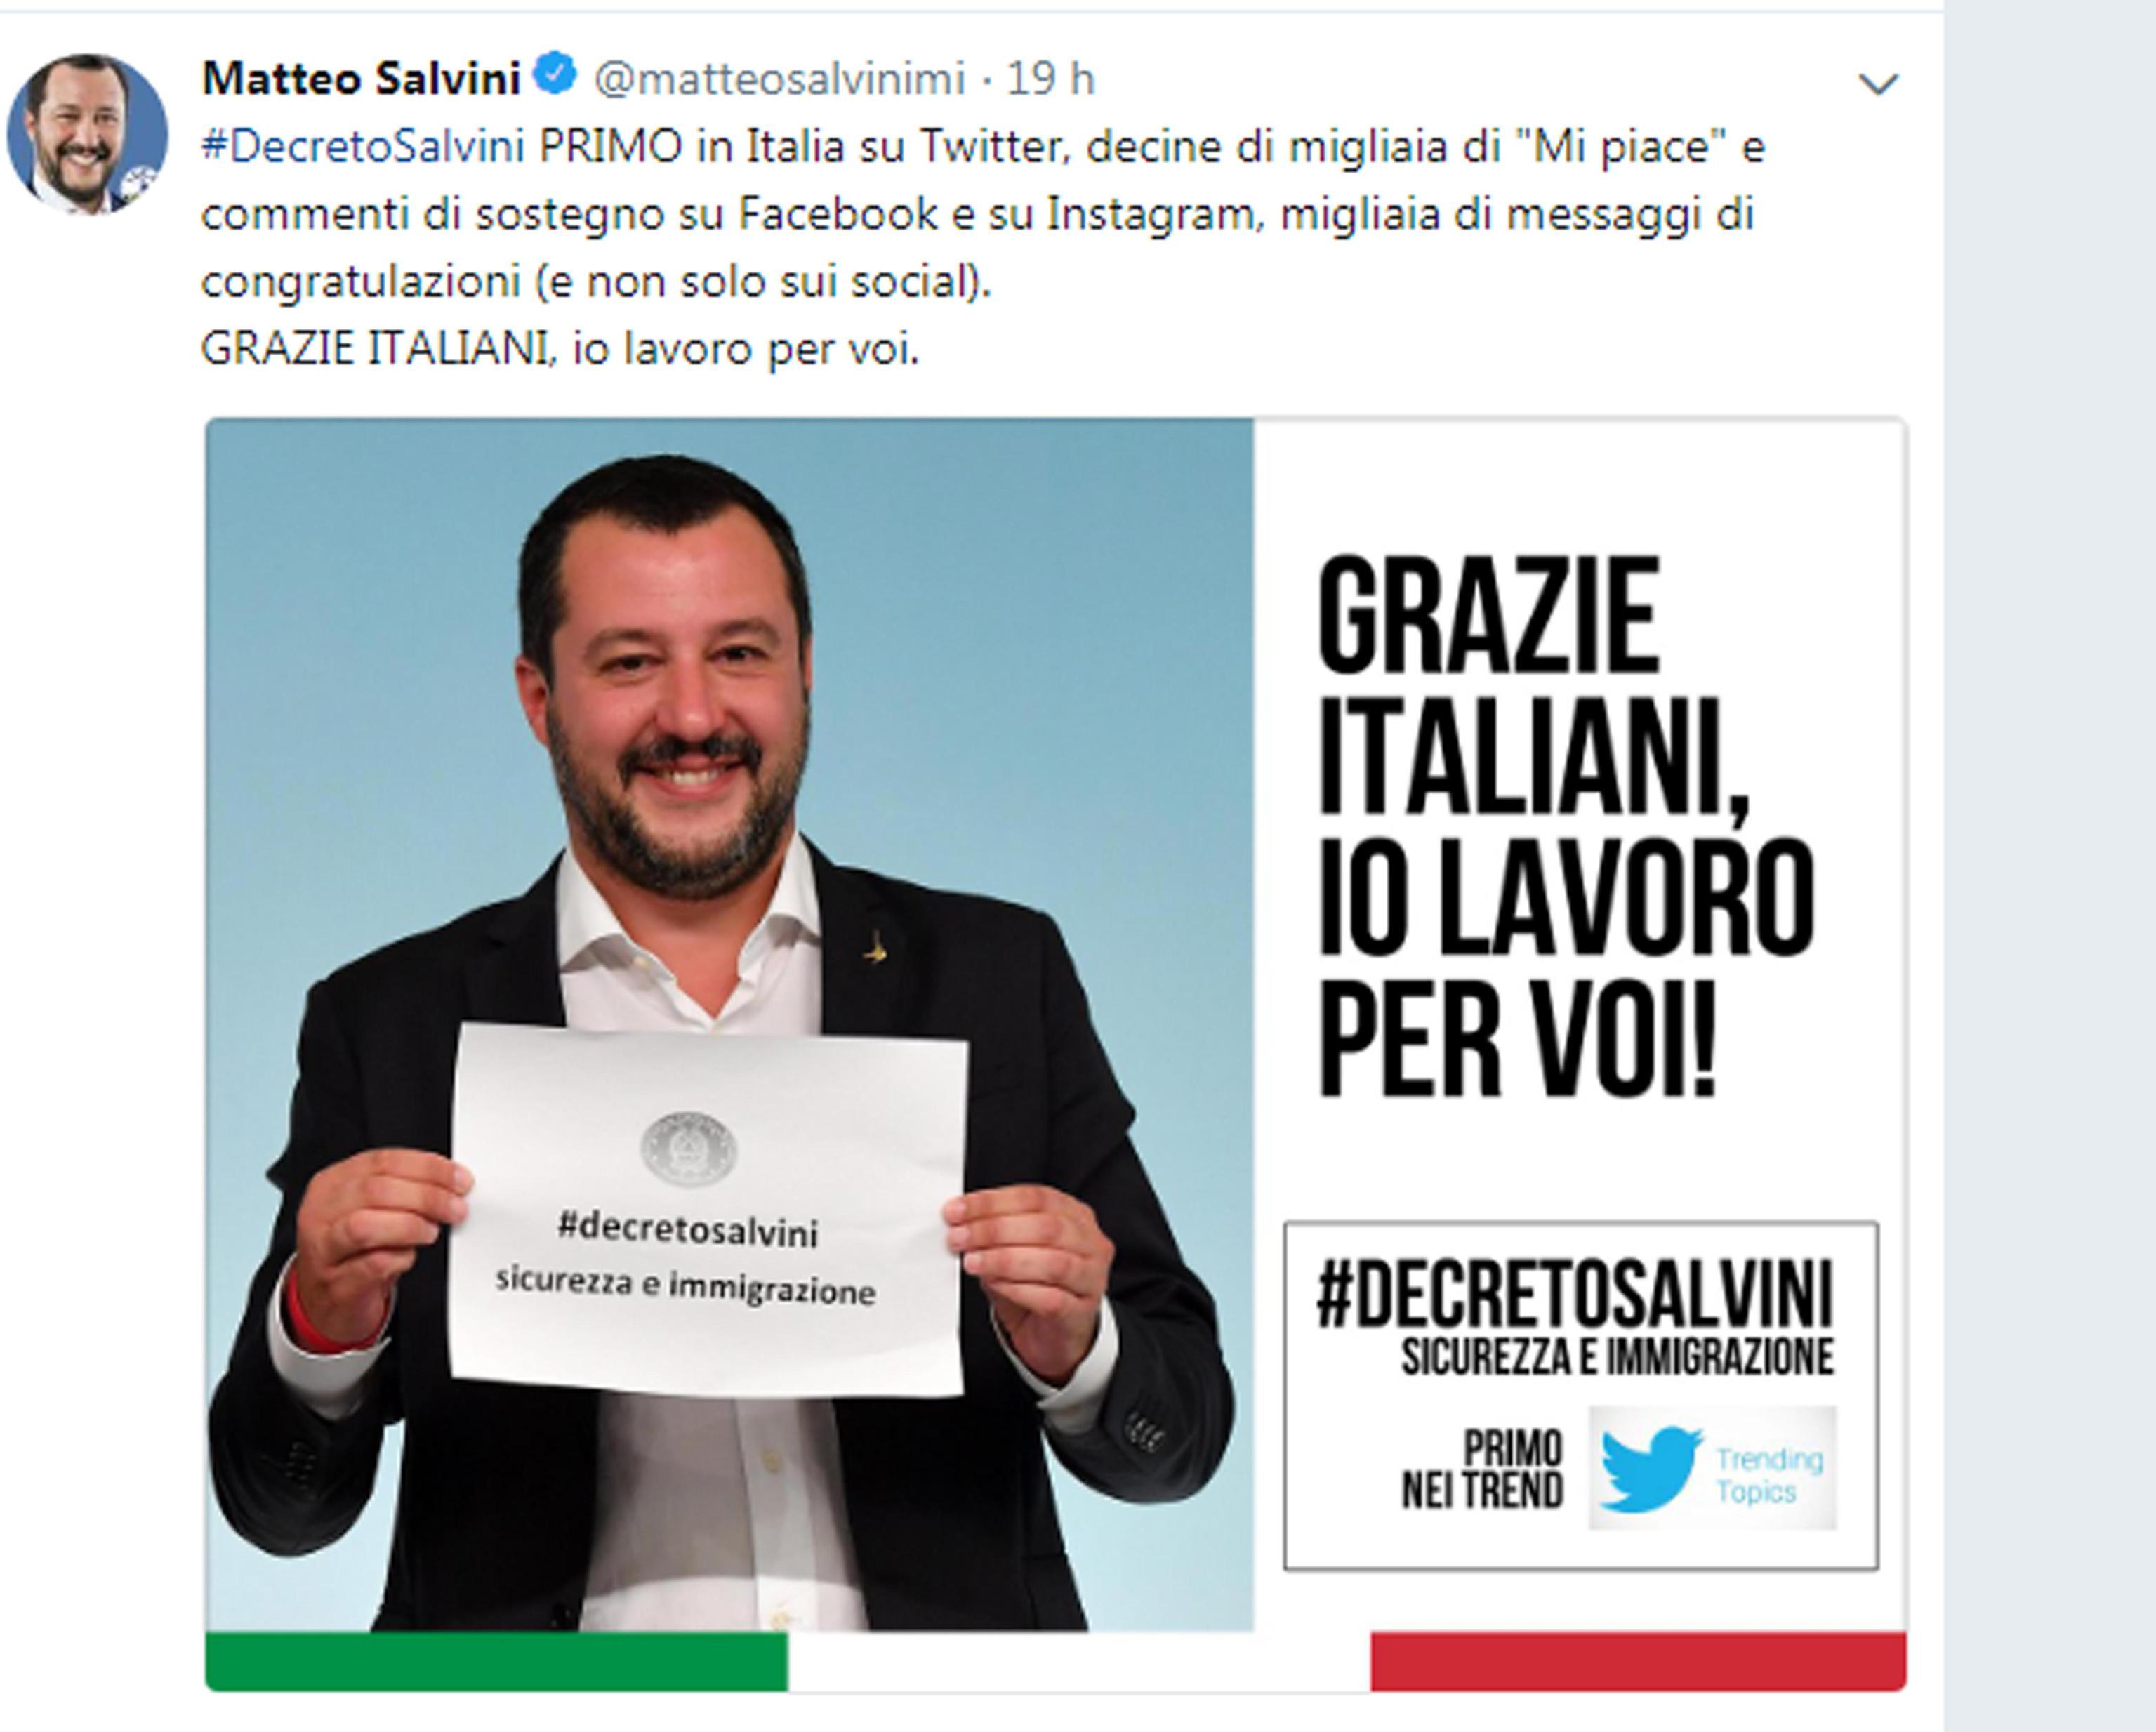 Salvini su Facebook, grazie italiani io lavoro per voi